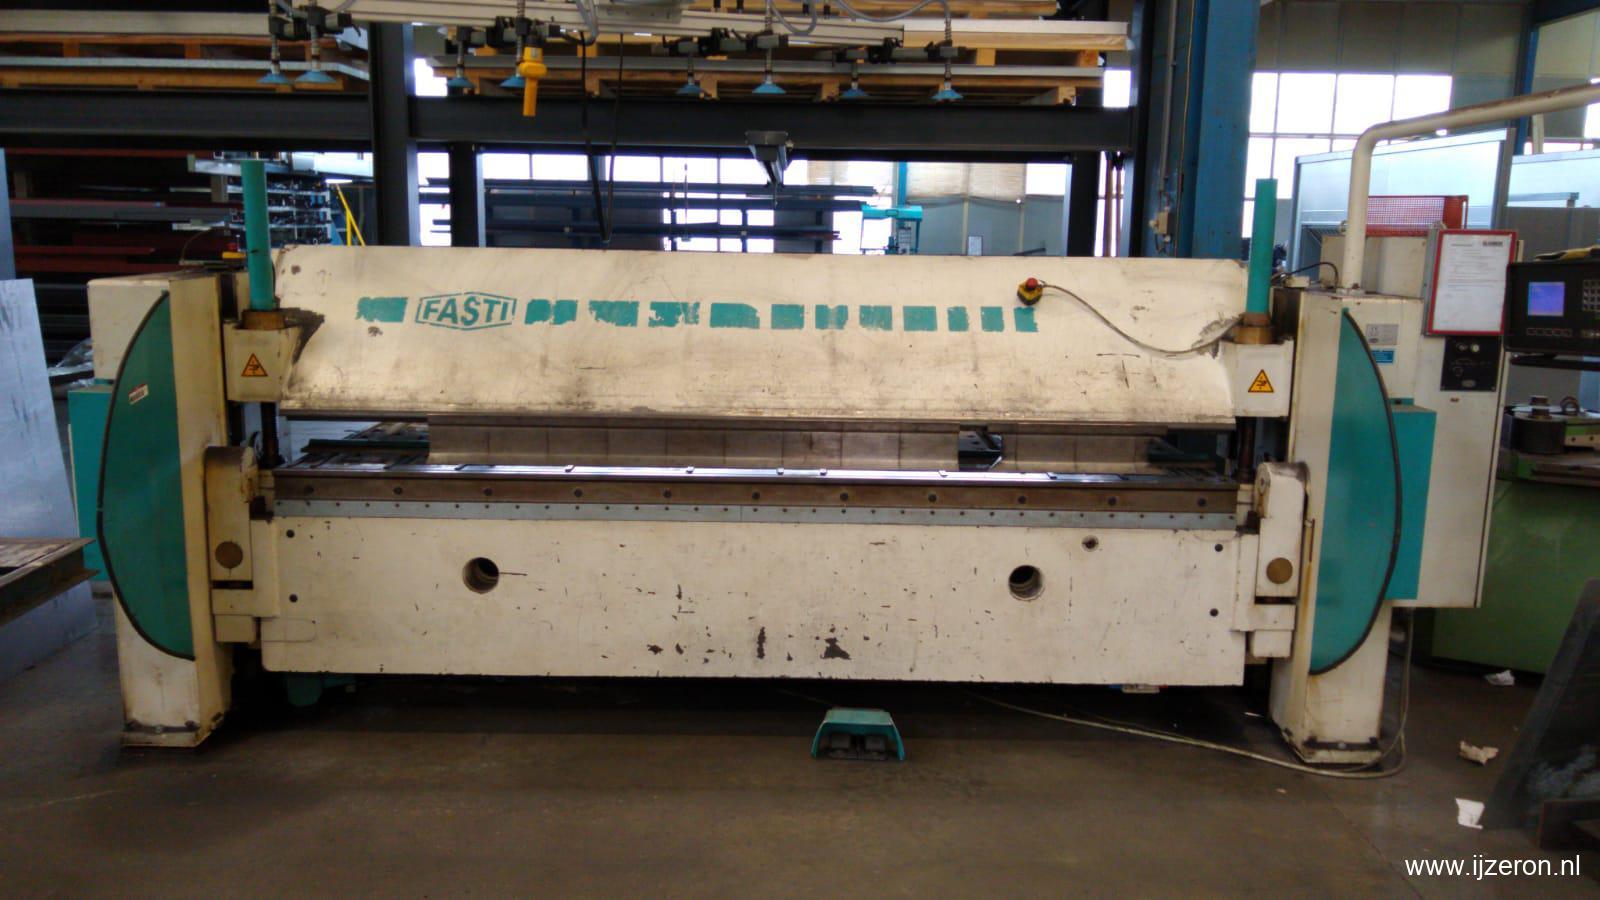 Fasti Foldingmachine